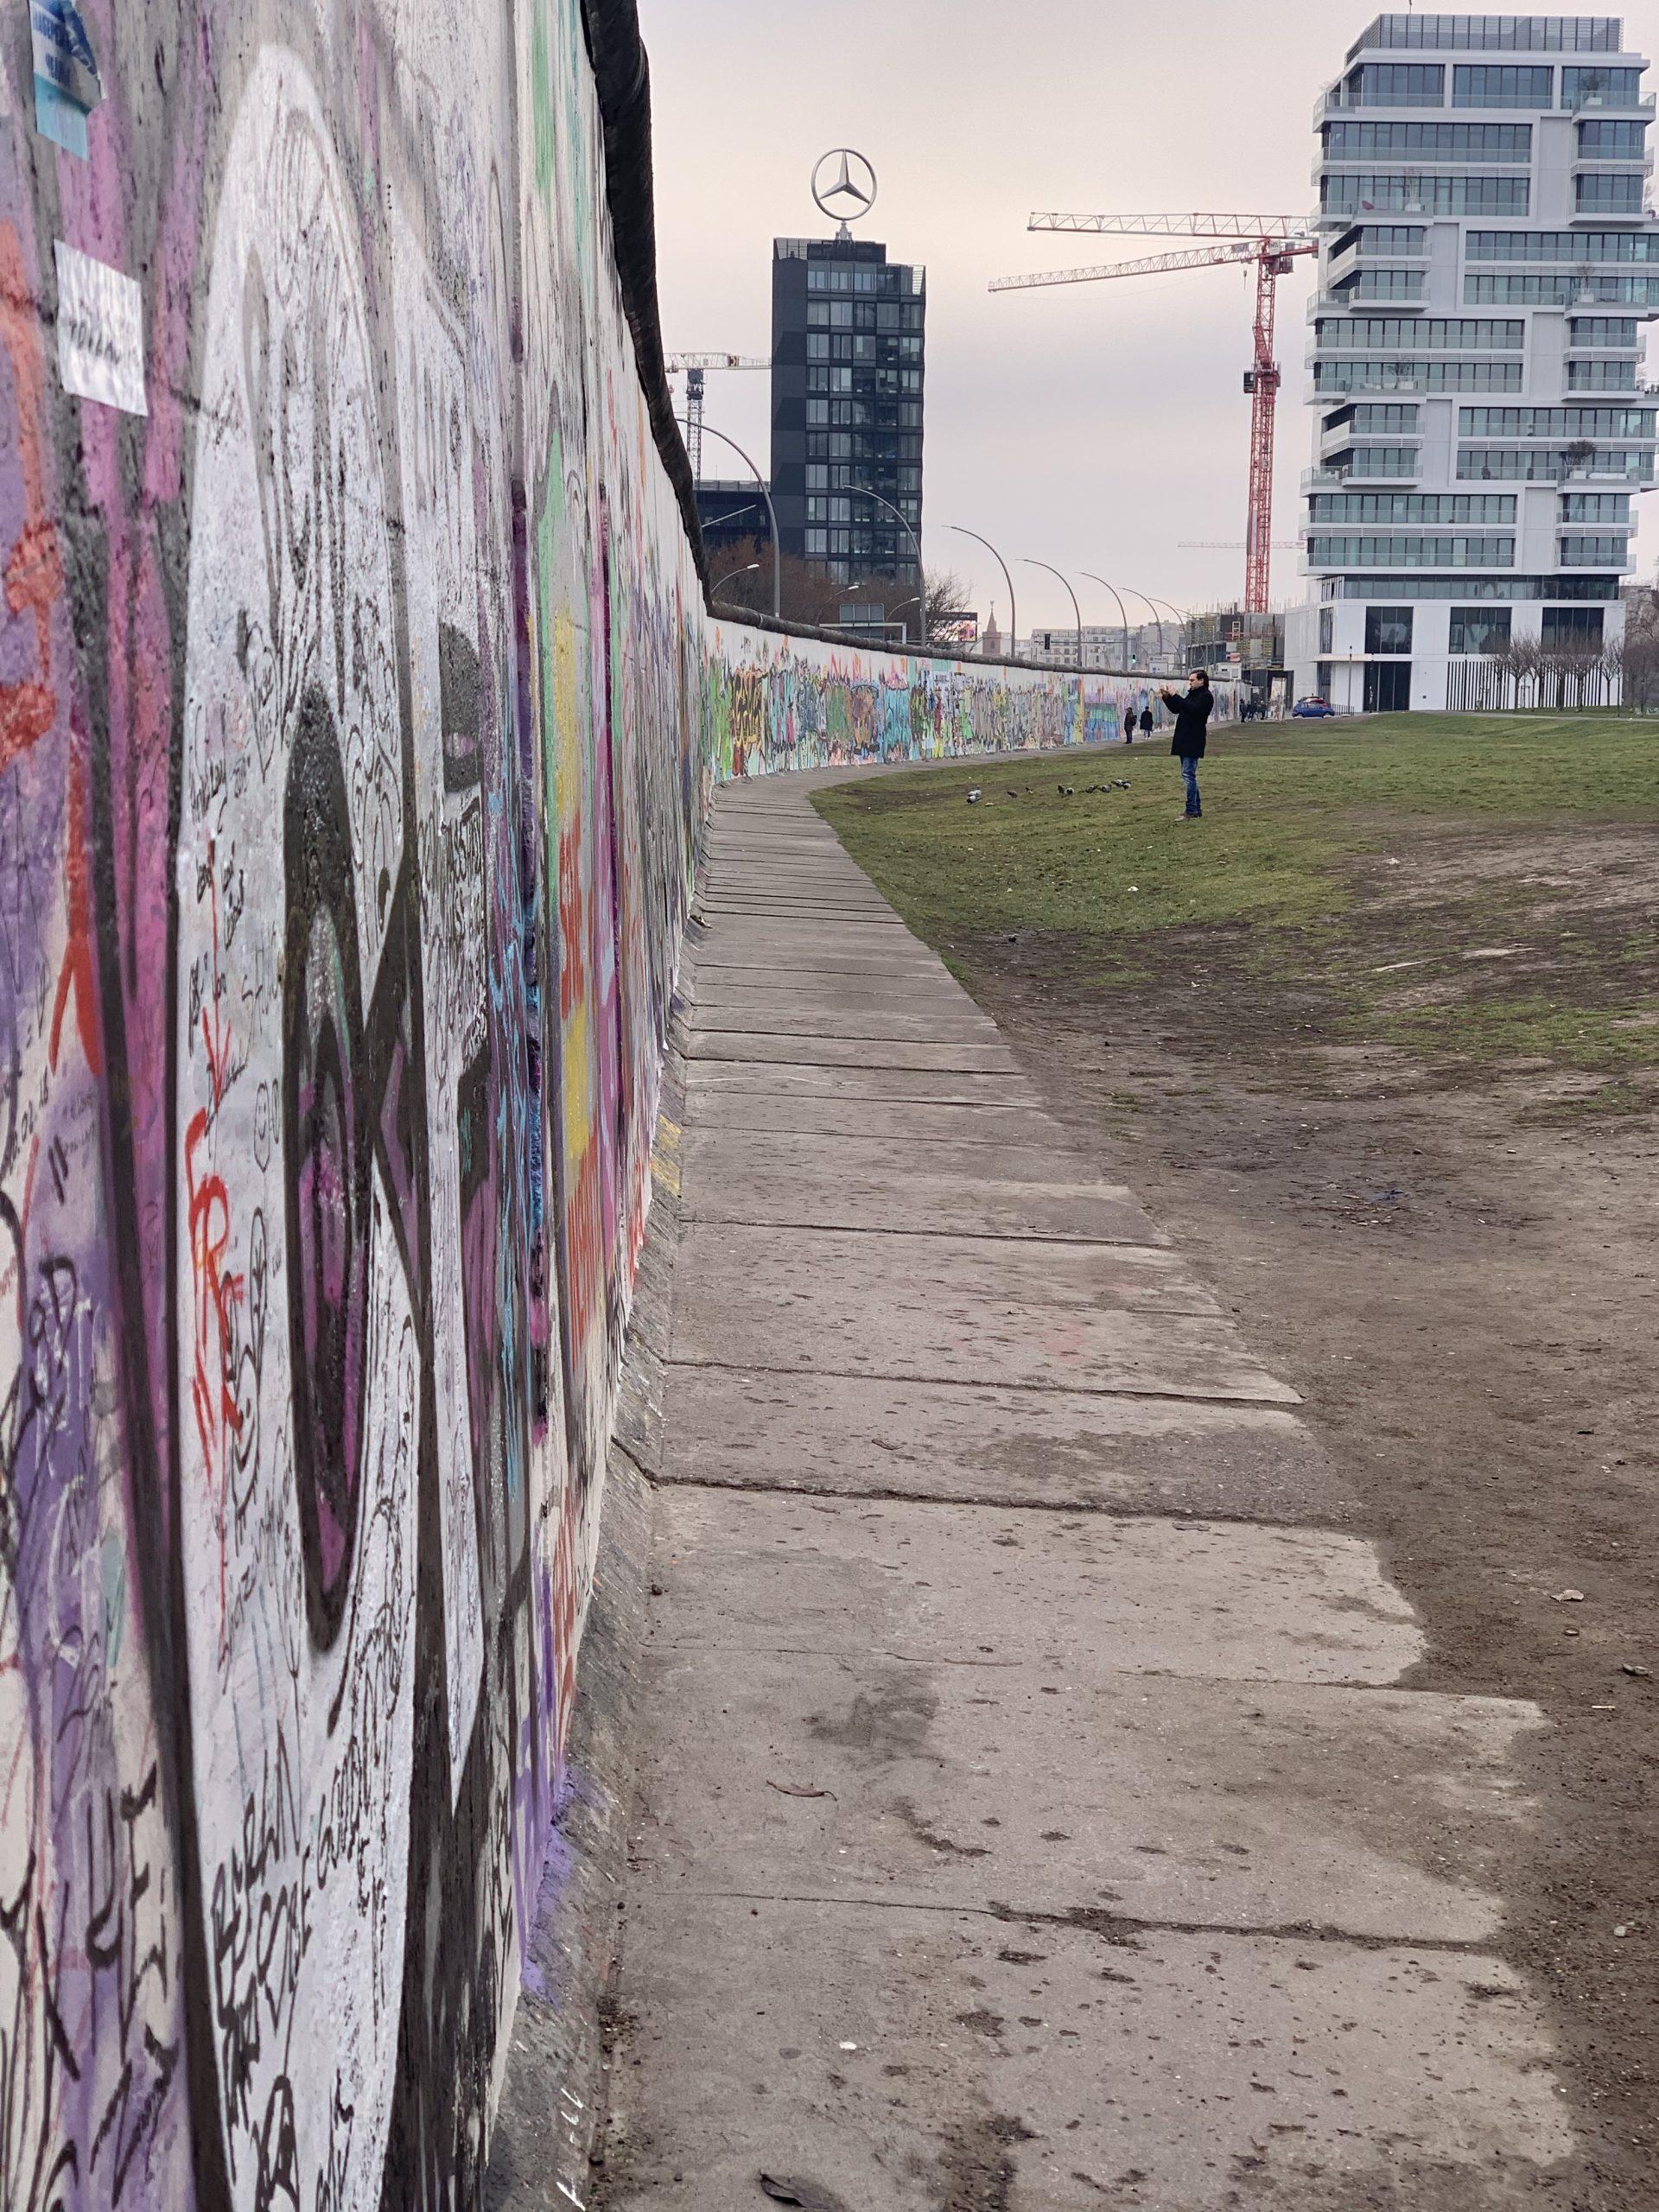 Visiter Berlin en 2, 3 ou 4 jours